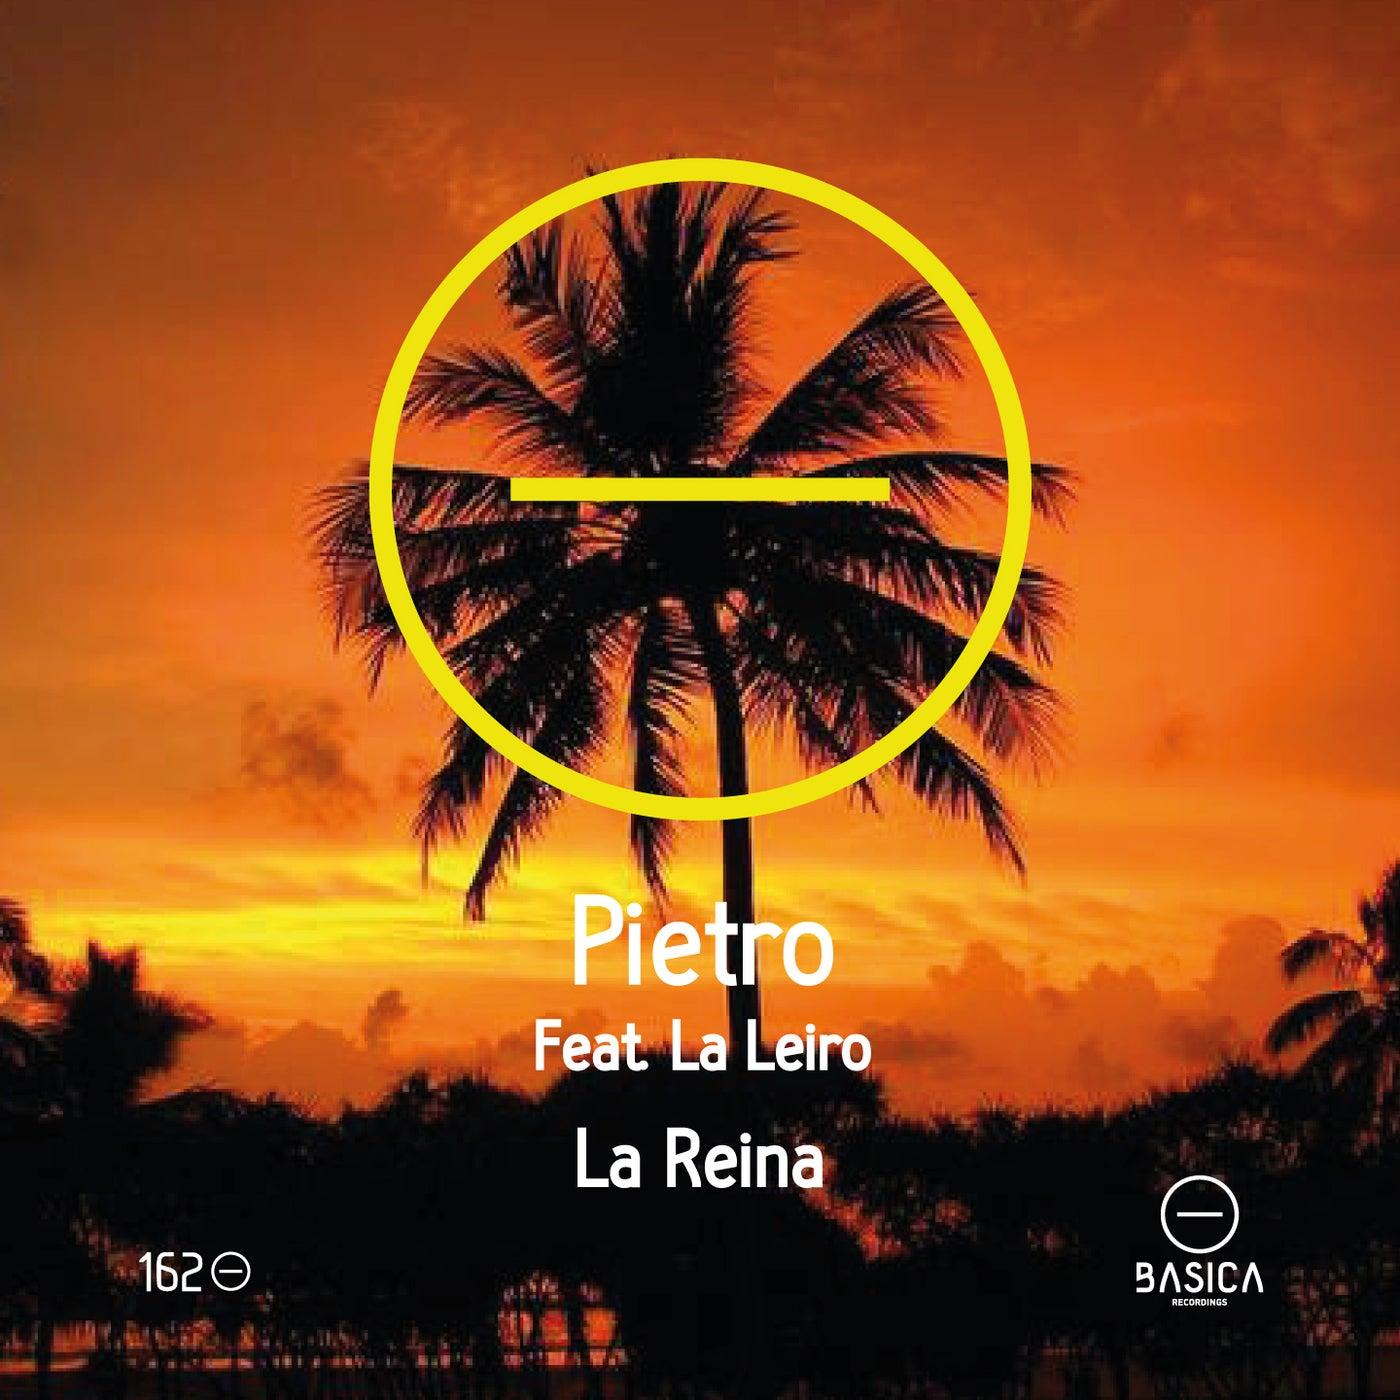 La Reina Feat. La Leiro (Extended Mix)